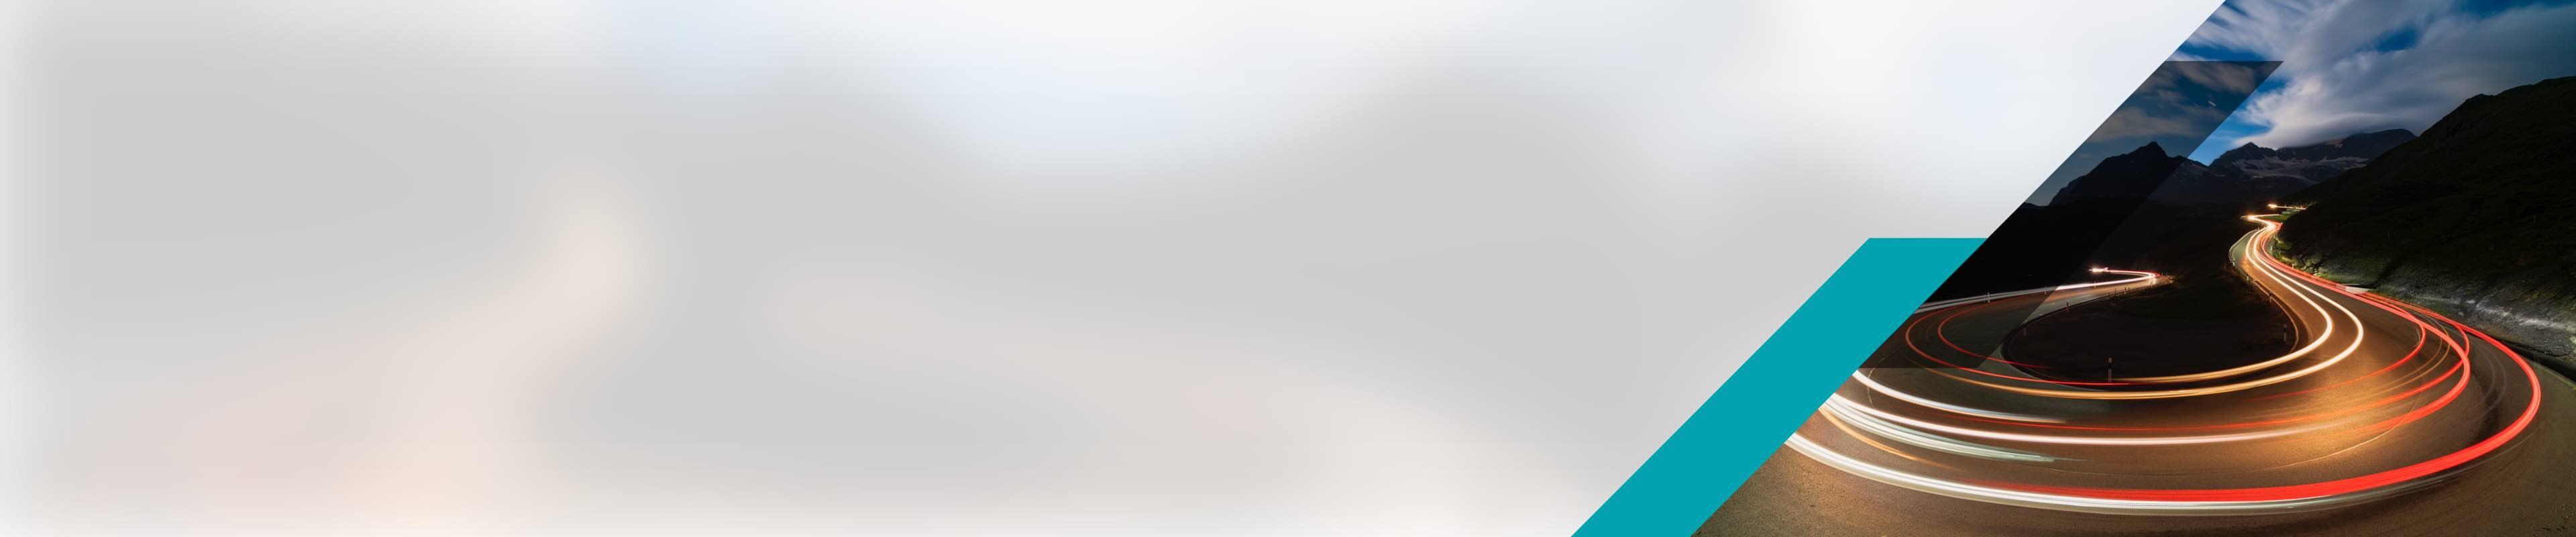 c01v2-light-mint-general-fast-road-blurred-curve